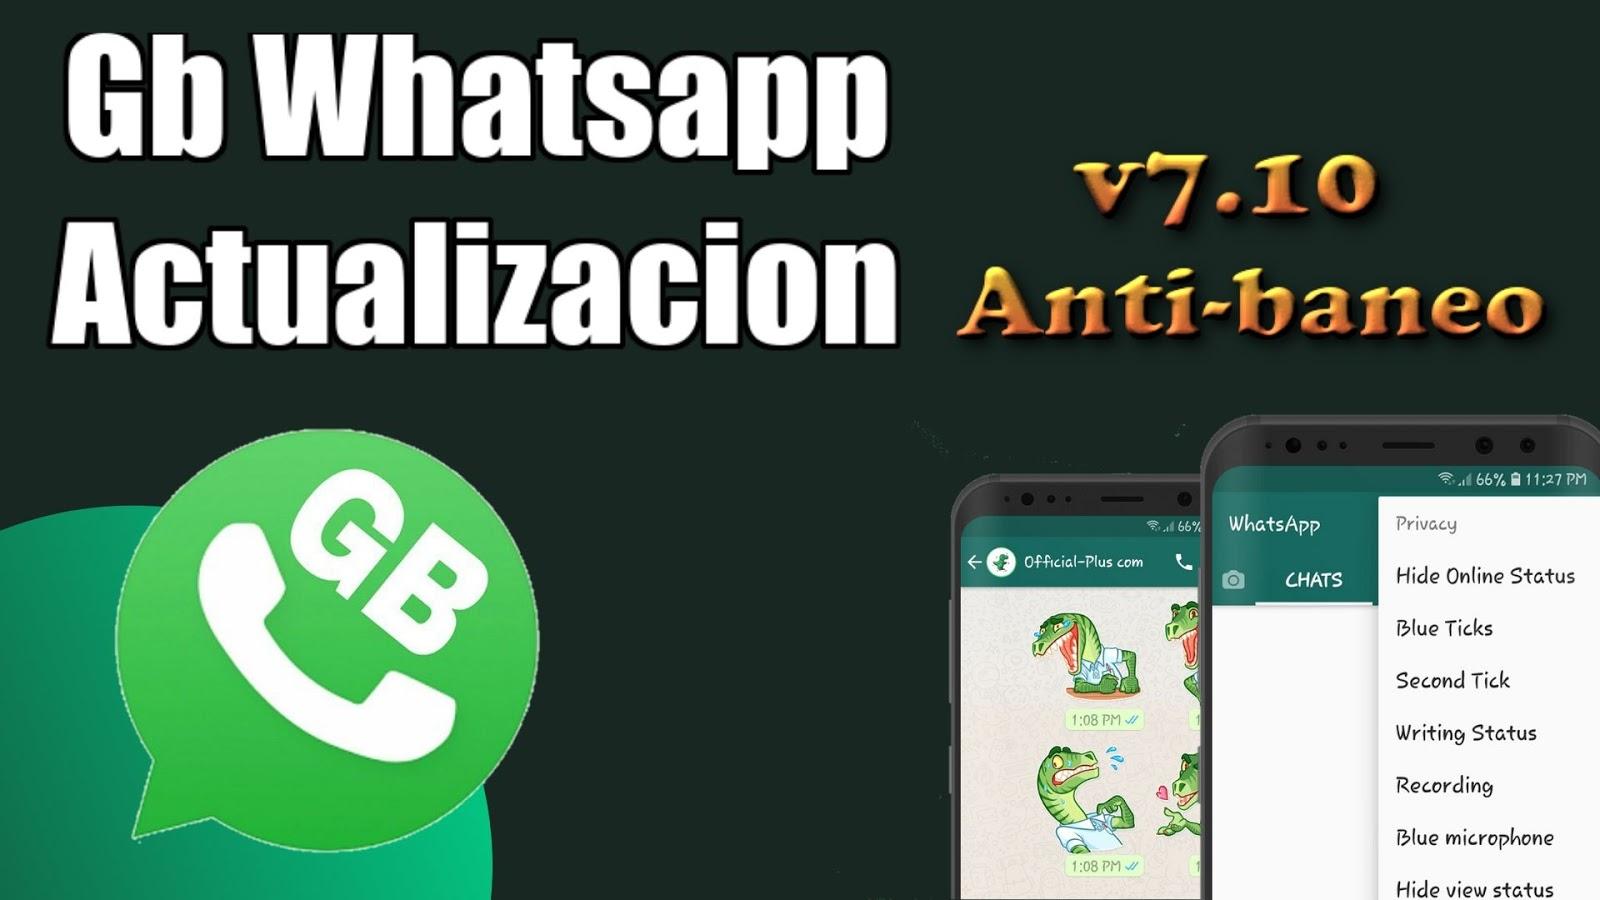 Ati Tecnology Gbwhatsapp V710 Anti Baneo 100